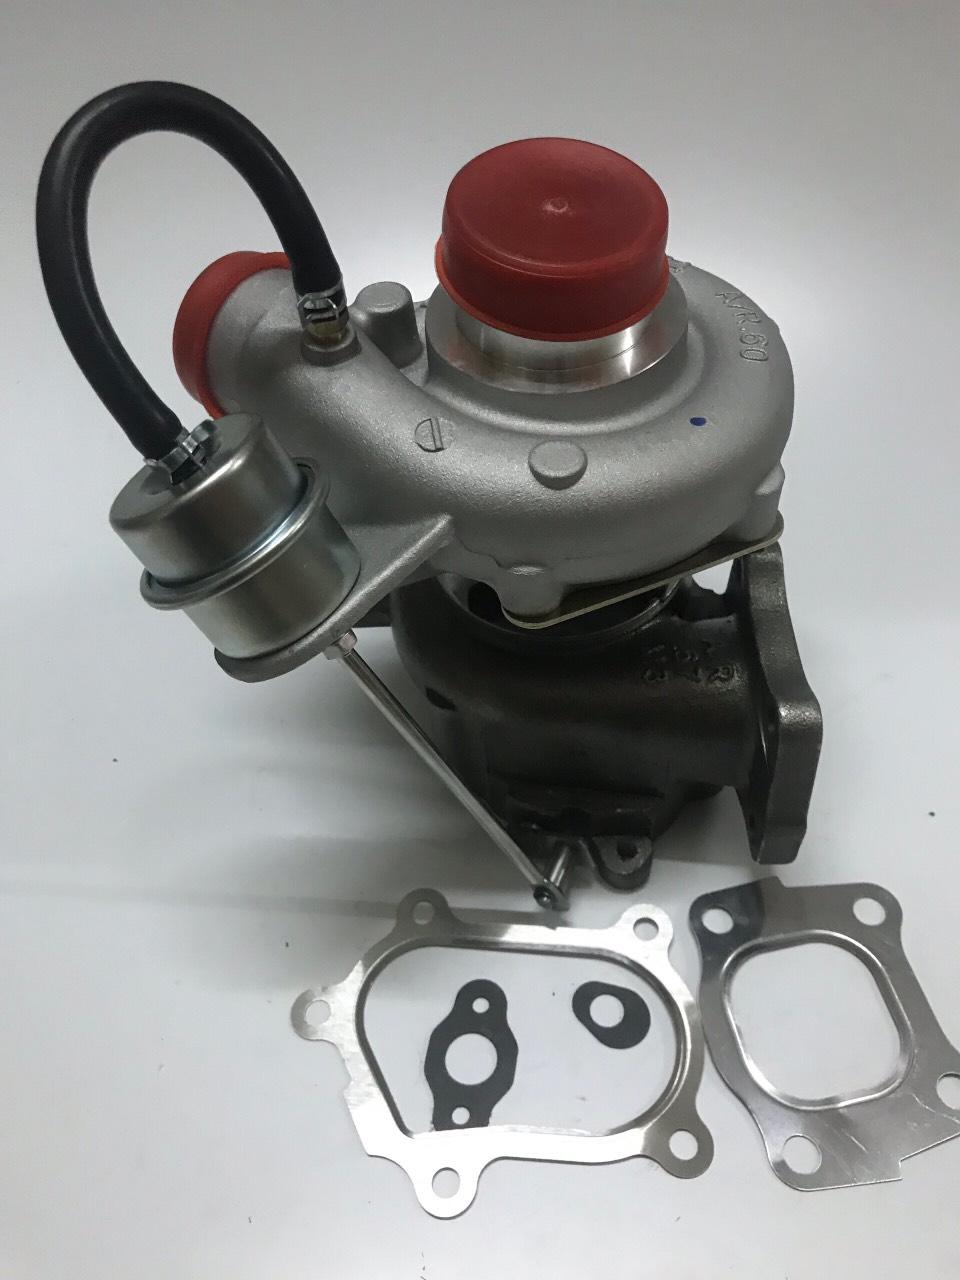 Turbo Xe Khách ISUZU SAMCO, Xe Tải ISUZU NQR 5 Tấn 4HK1- 5.2 Lít